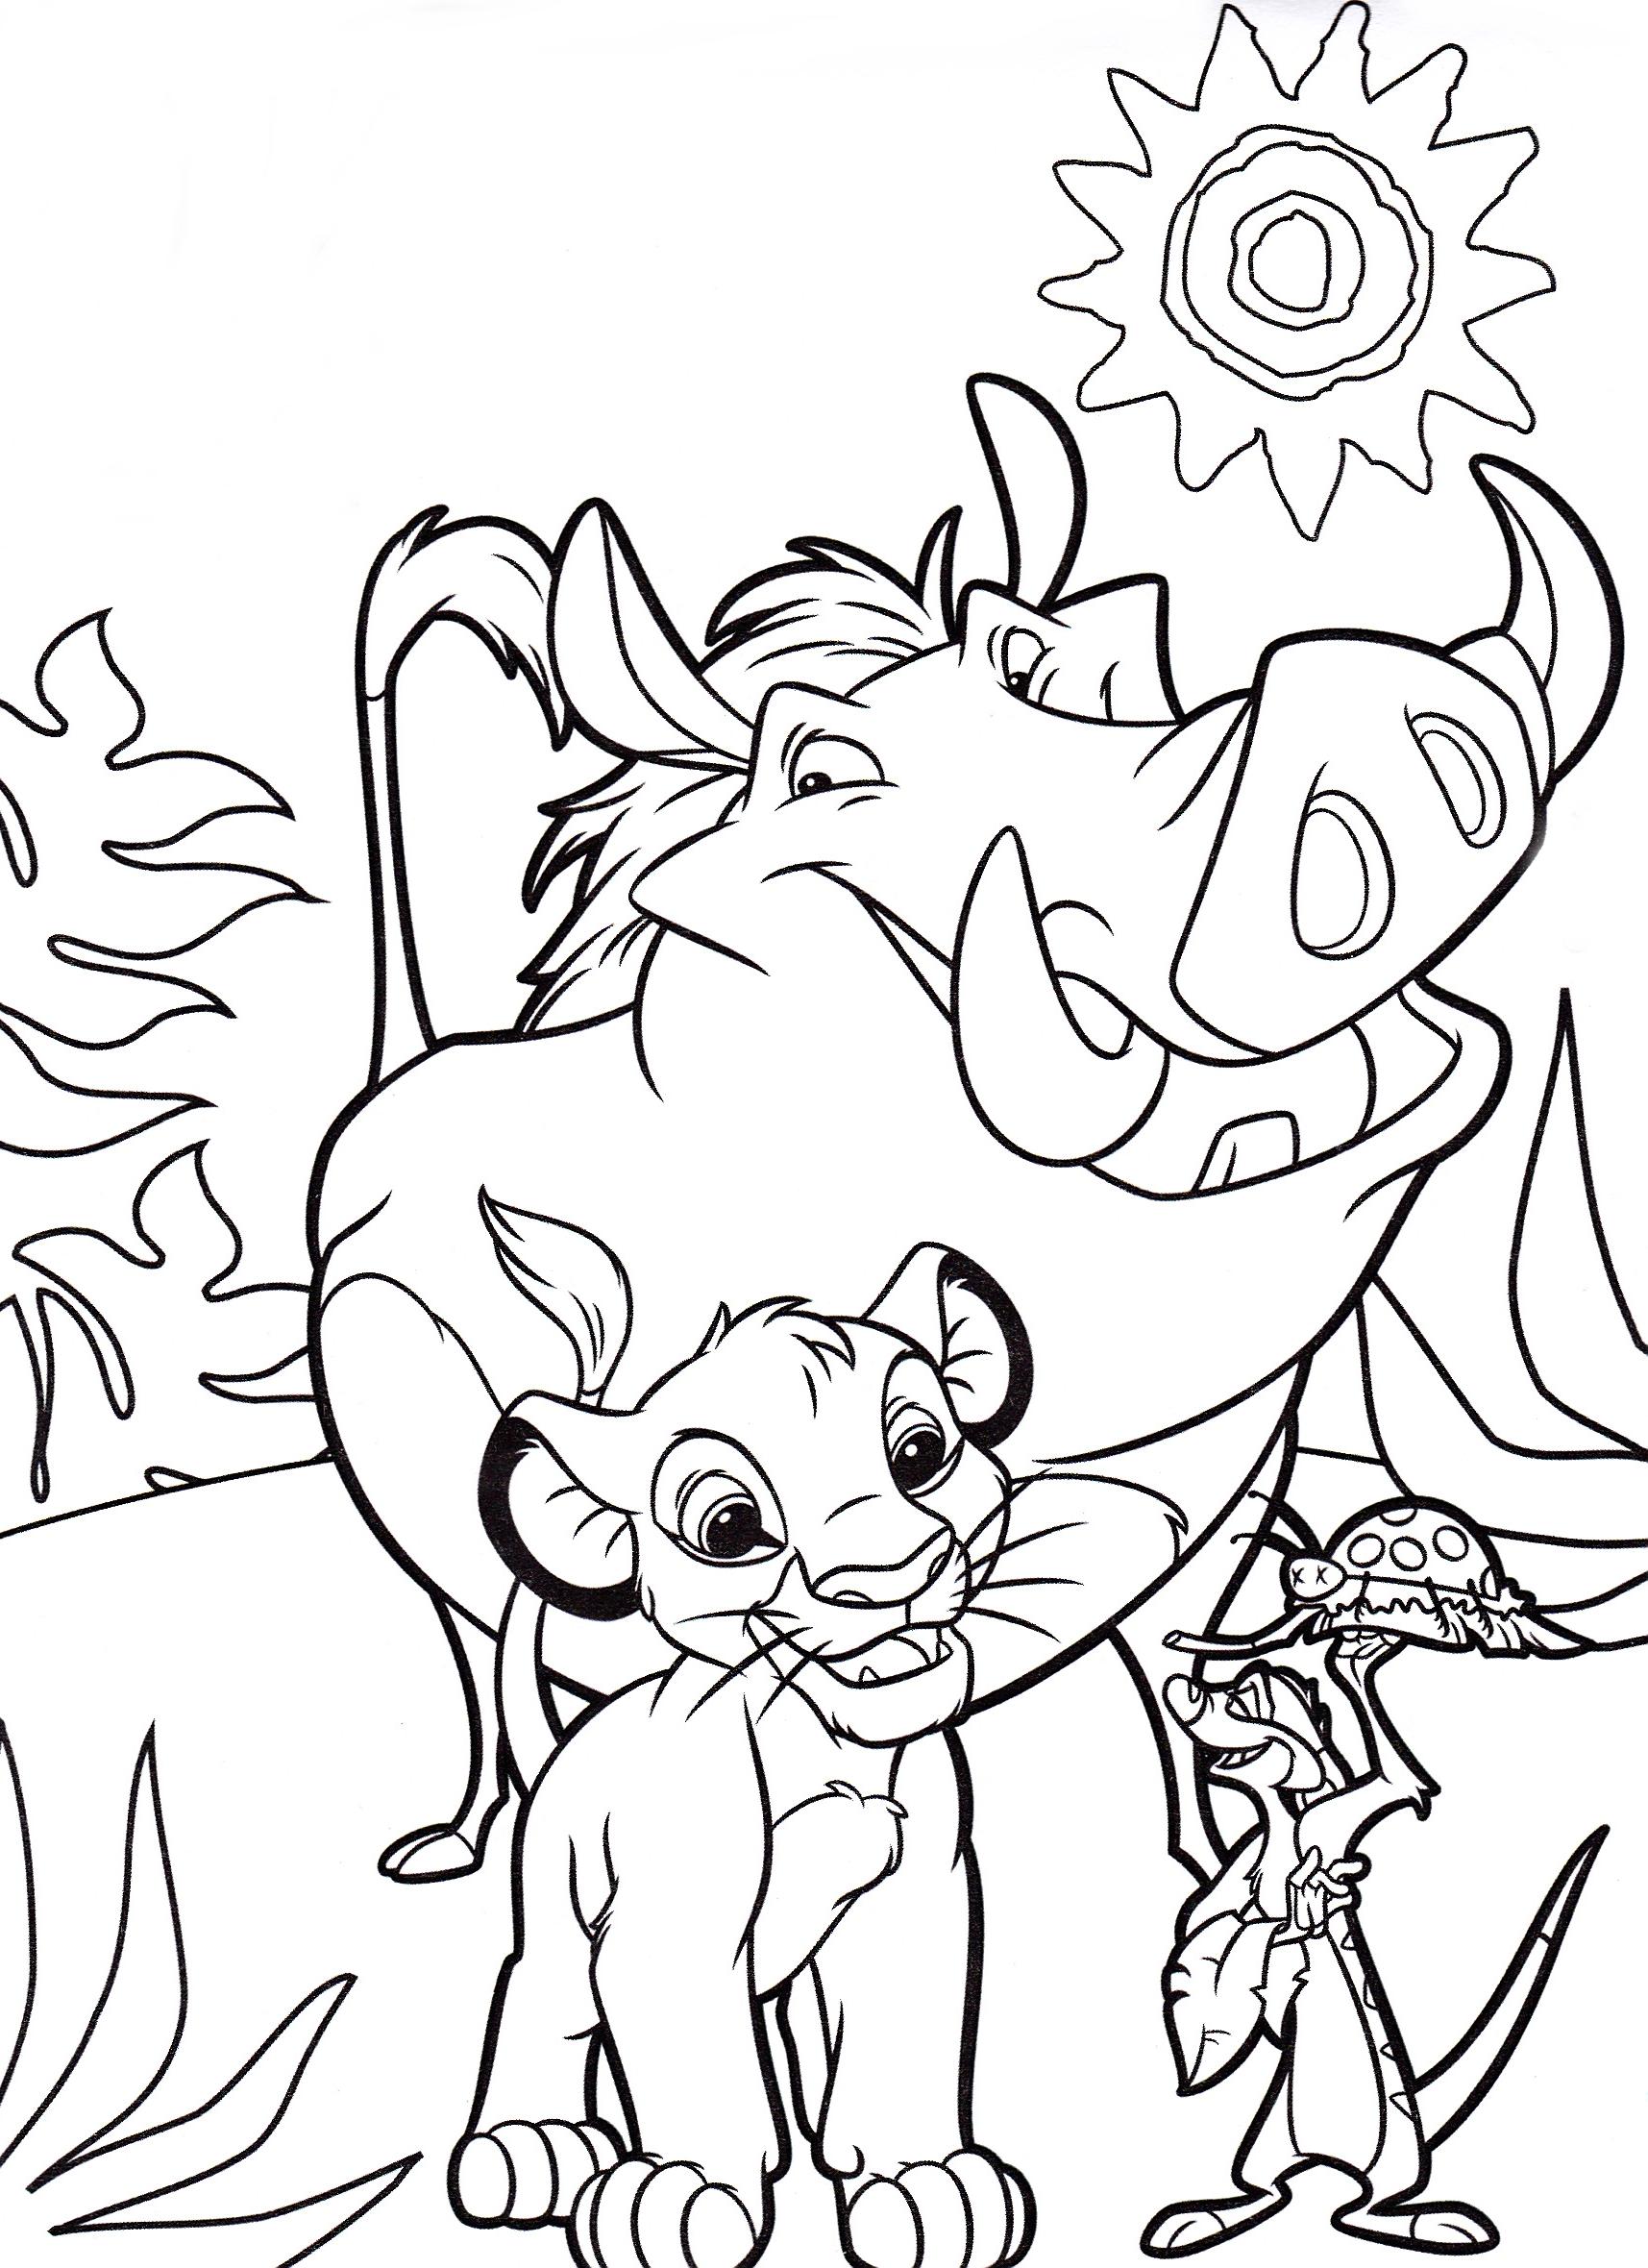 Walt Disney Coloring Pages - Pumbaa, Simba & Timon ...